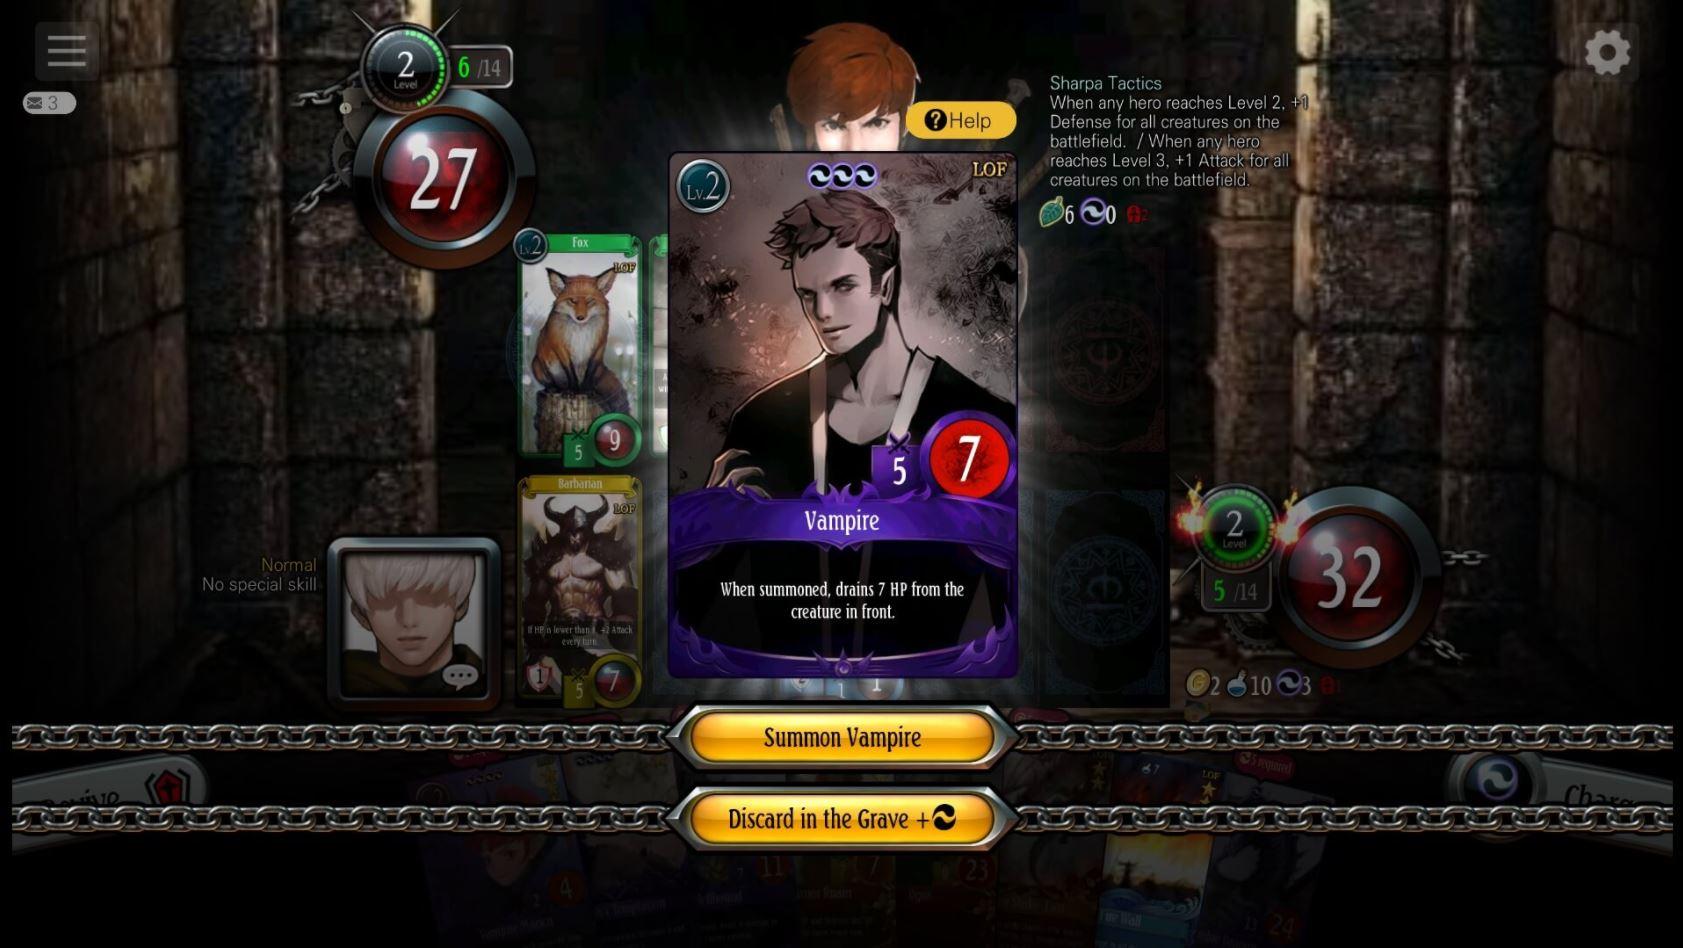 duel-of-summoners-the-mabinogi-trading-card-game-date-de-sortie-1236